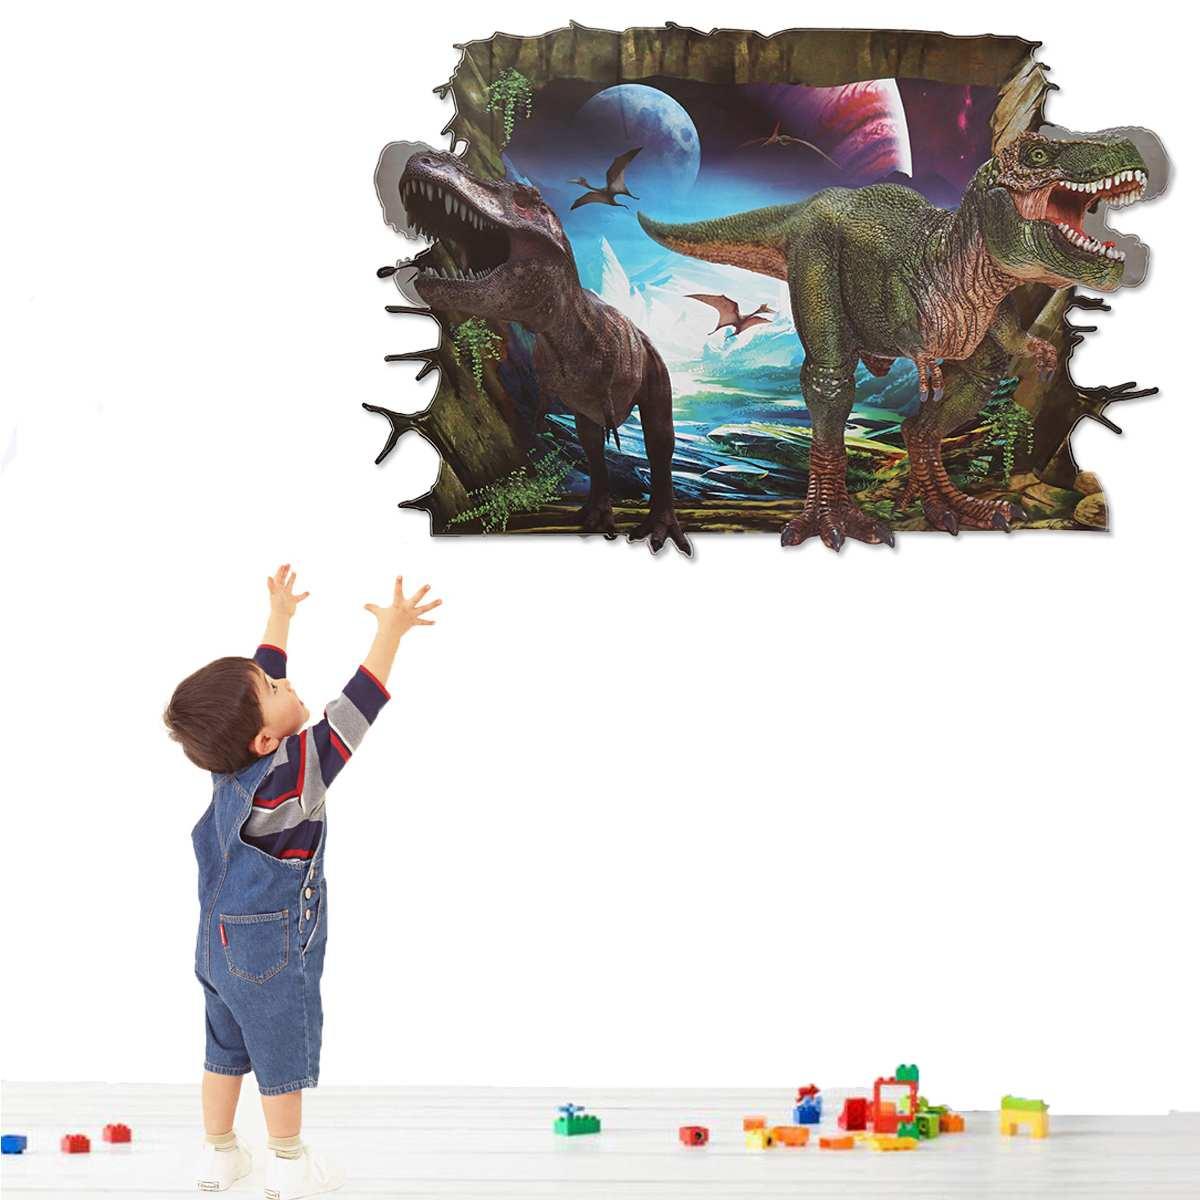 60x90cm 3D Stereoscopic Animal Dinosaur Wallpaper Home Children Room Painting Backdrop Wallpaper Art Mural Wall Paper Sticker